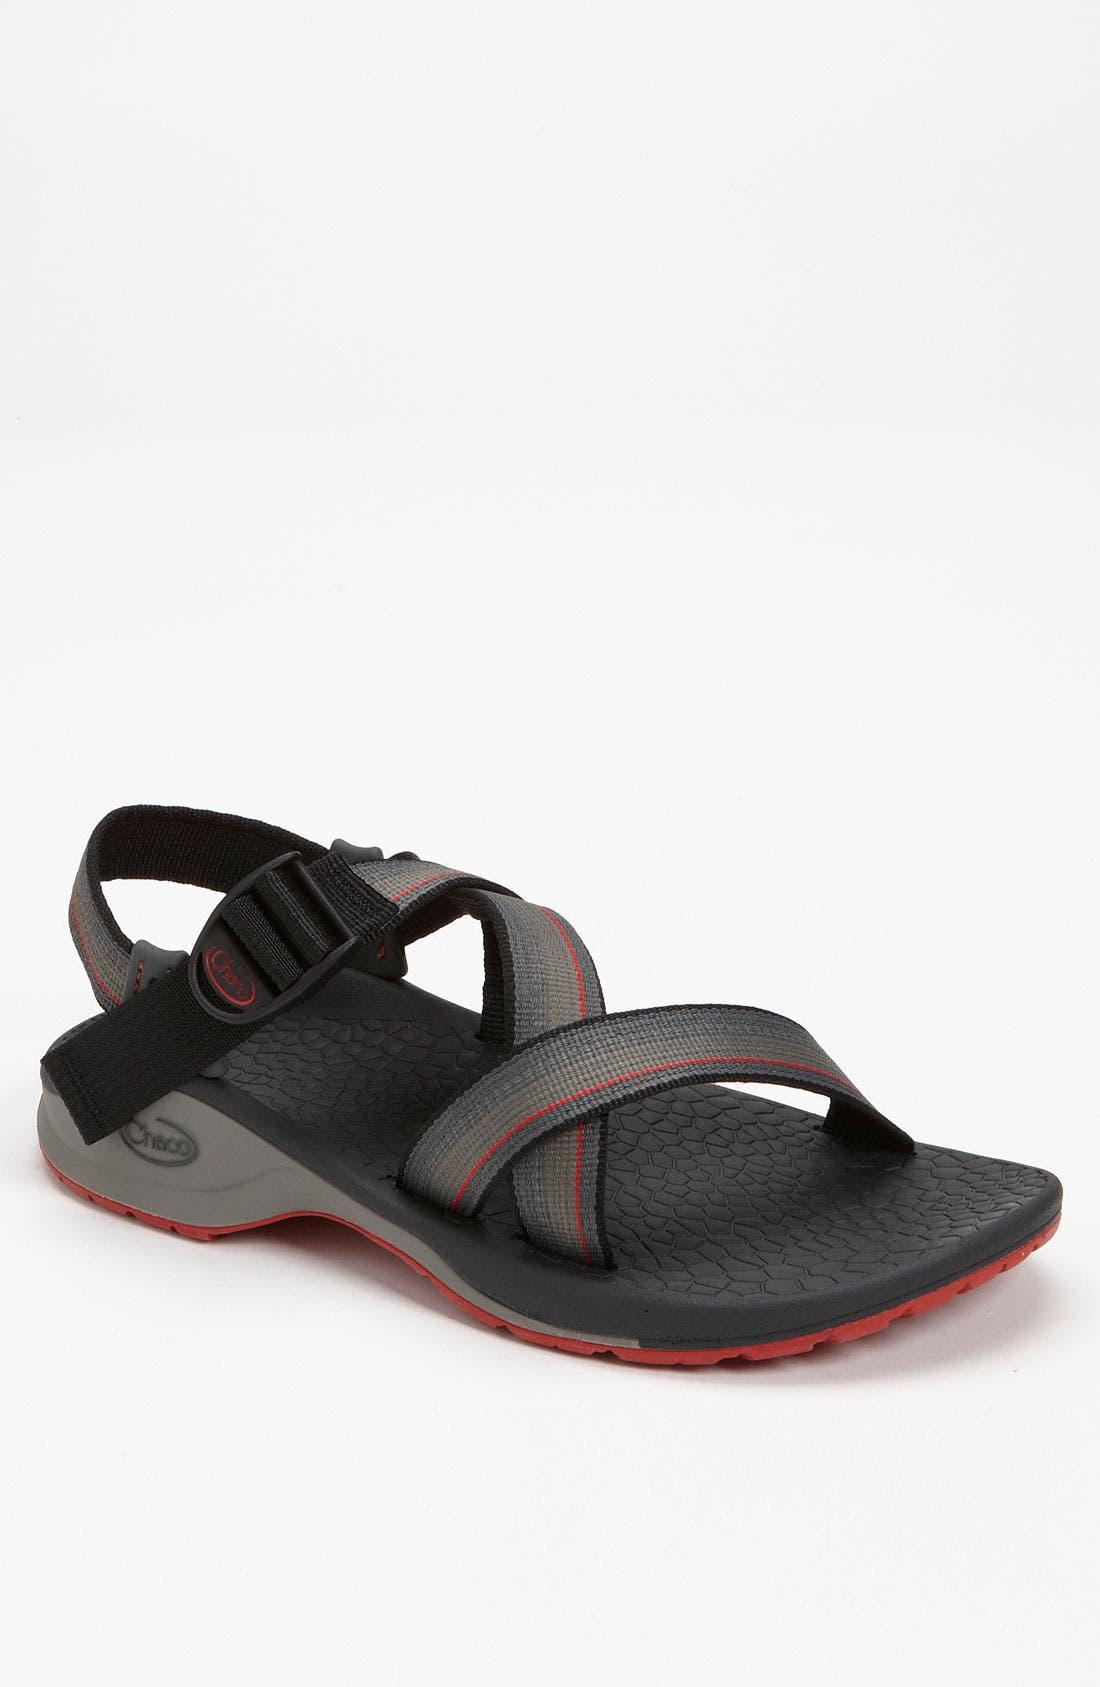 Alternate Image 1 Selected - Chaco 'Updraft' Sandal